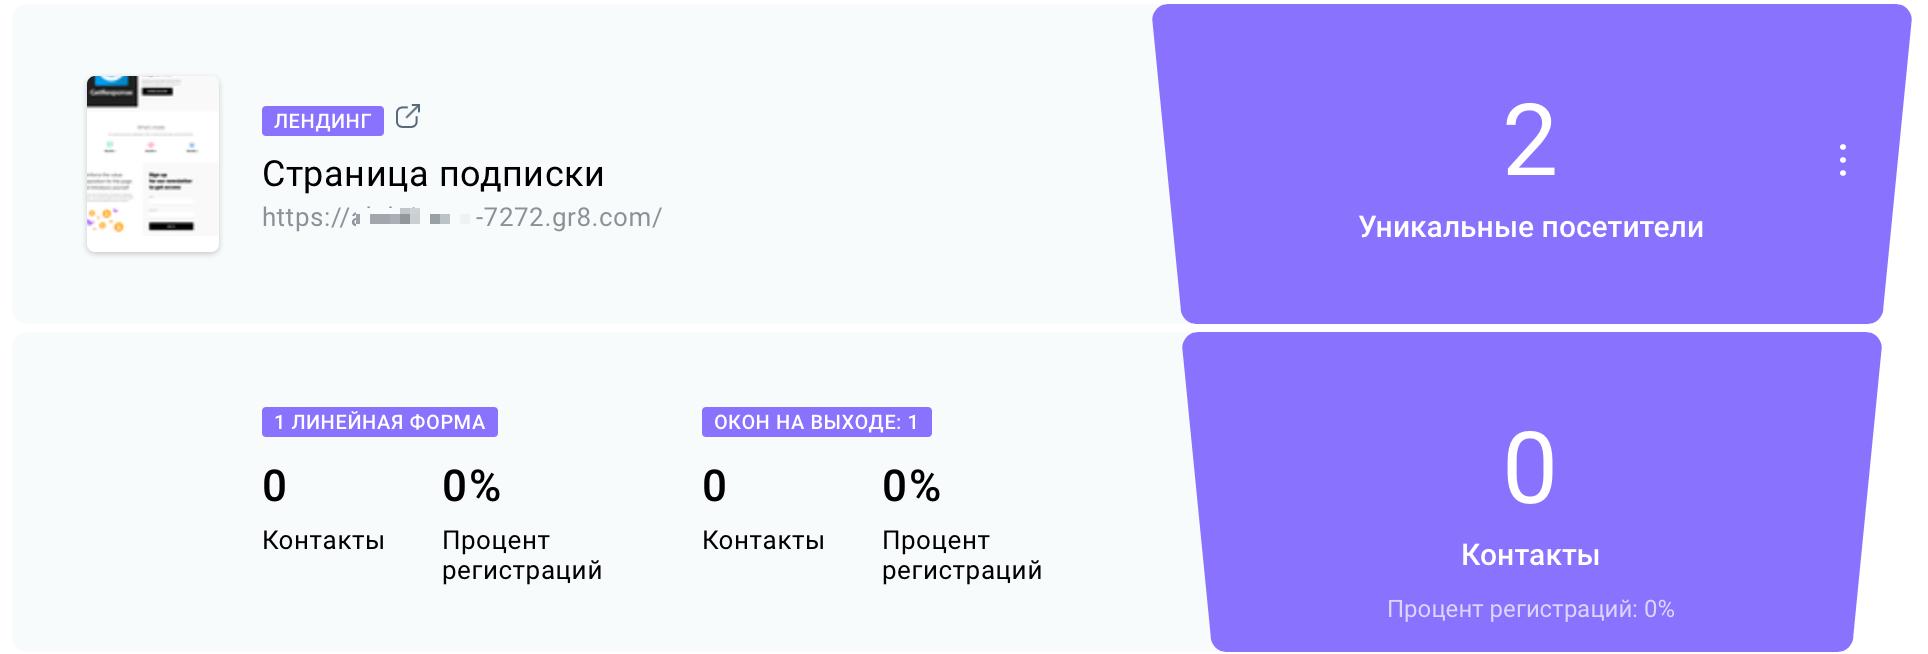 Статистика страницы регистрации.